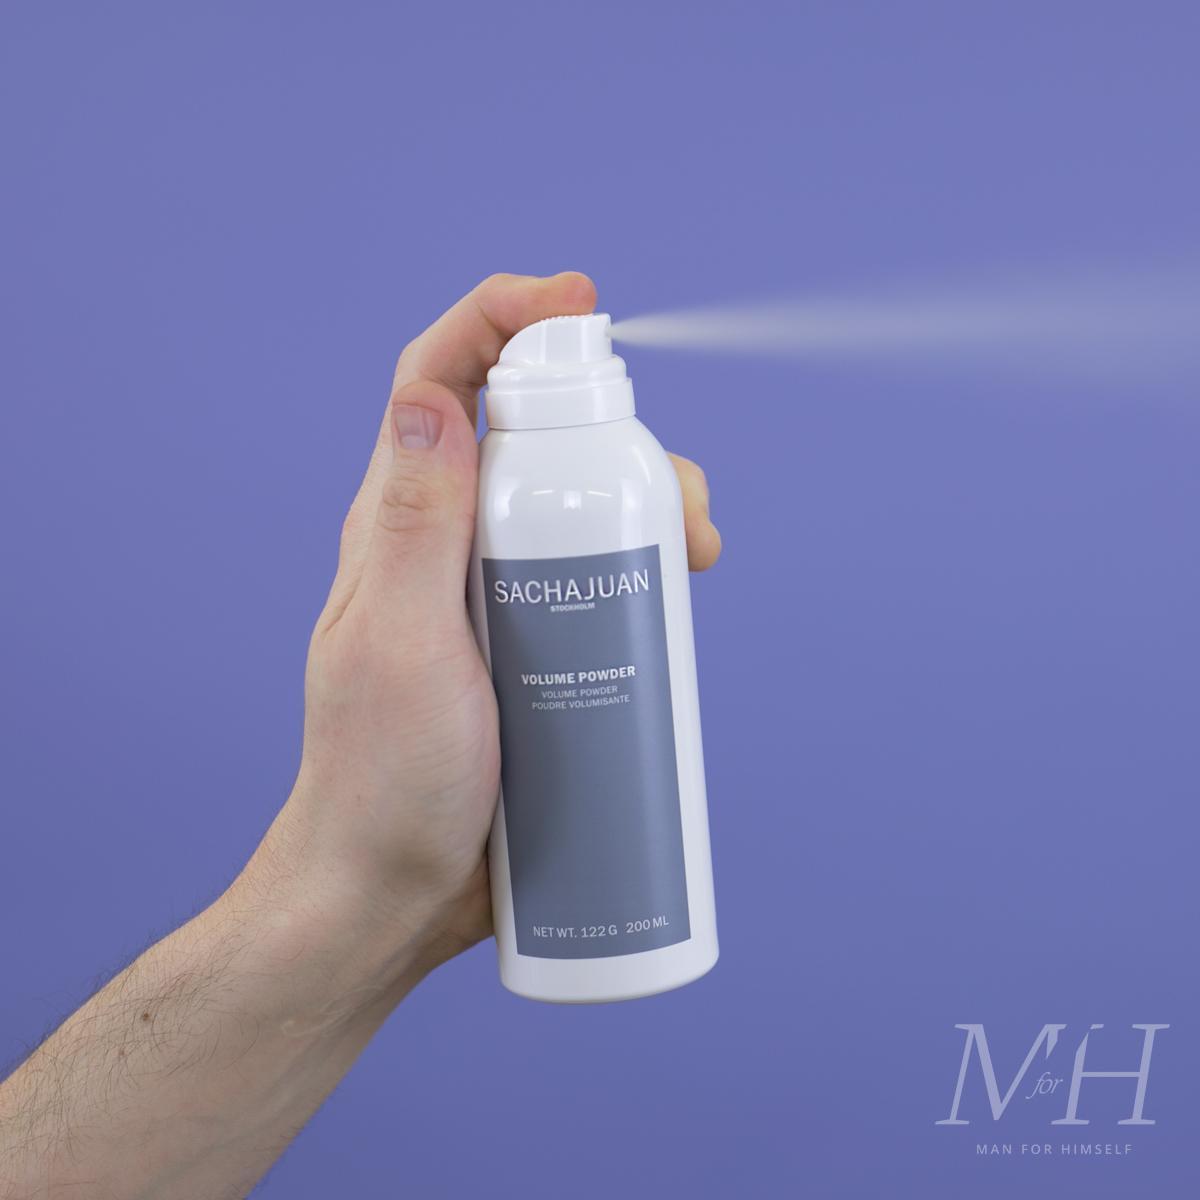 sachajuan-volume-powder-swatch-review-1-man-for-himself